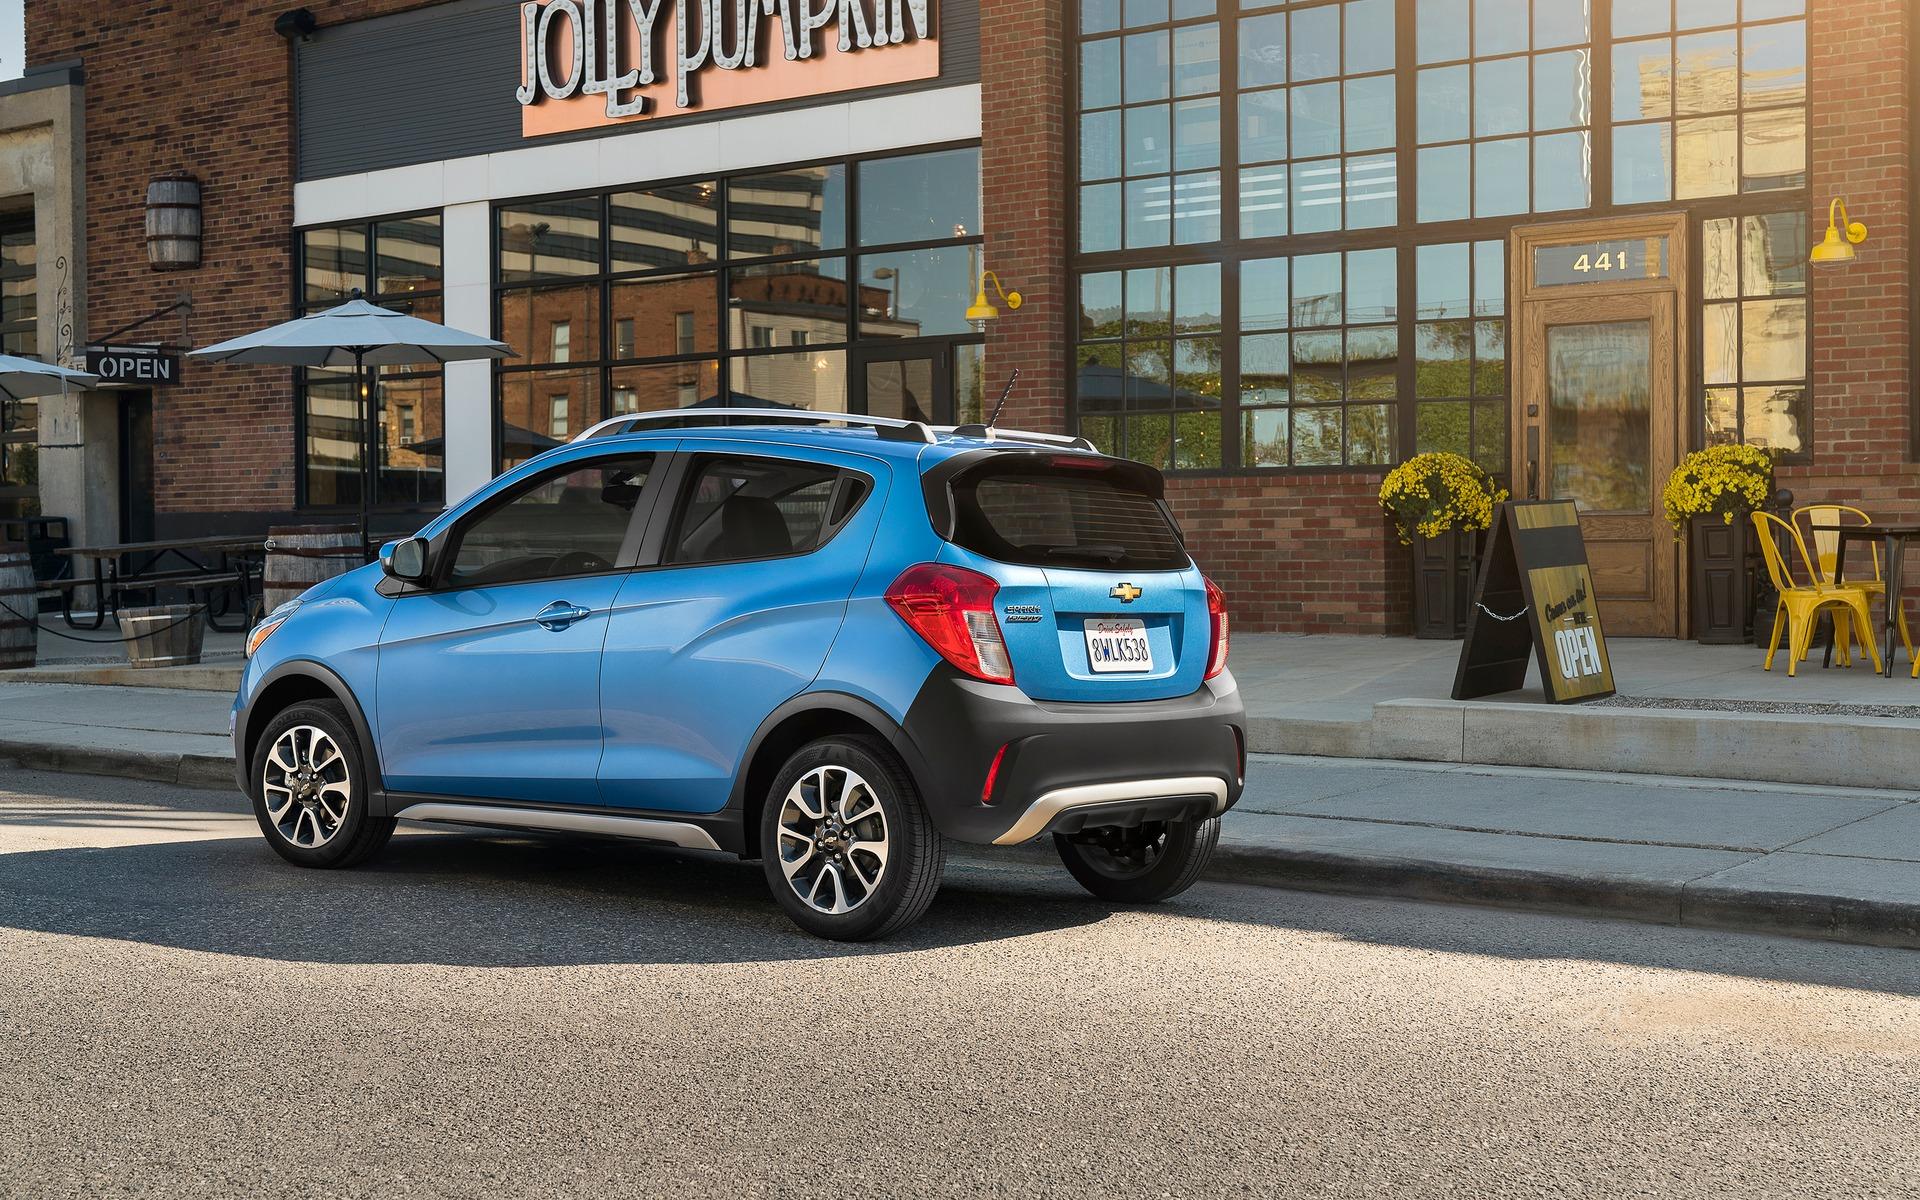 2018 Chevrolet Spark Photos 2 2 The Car Guide